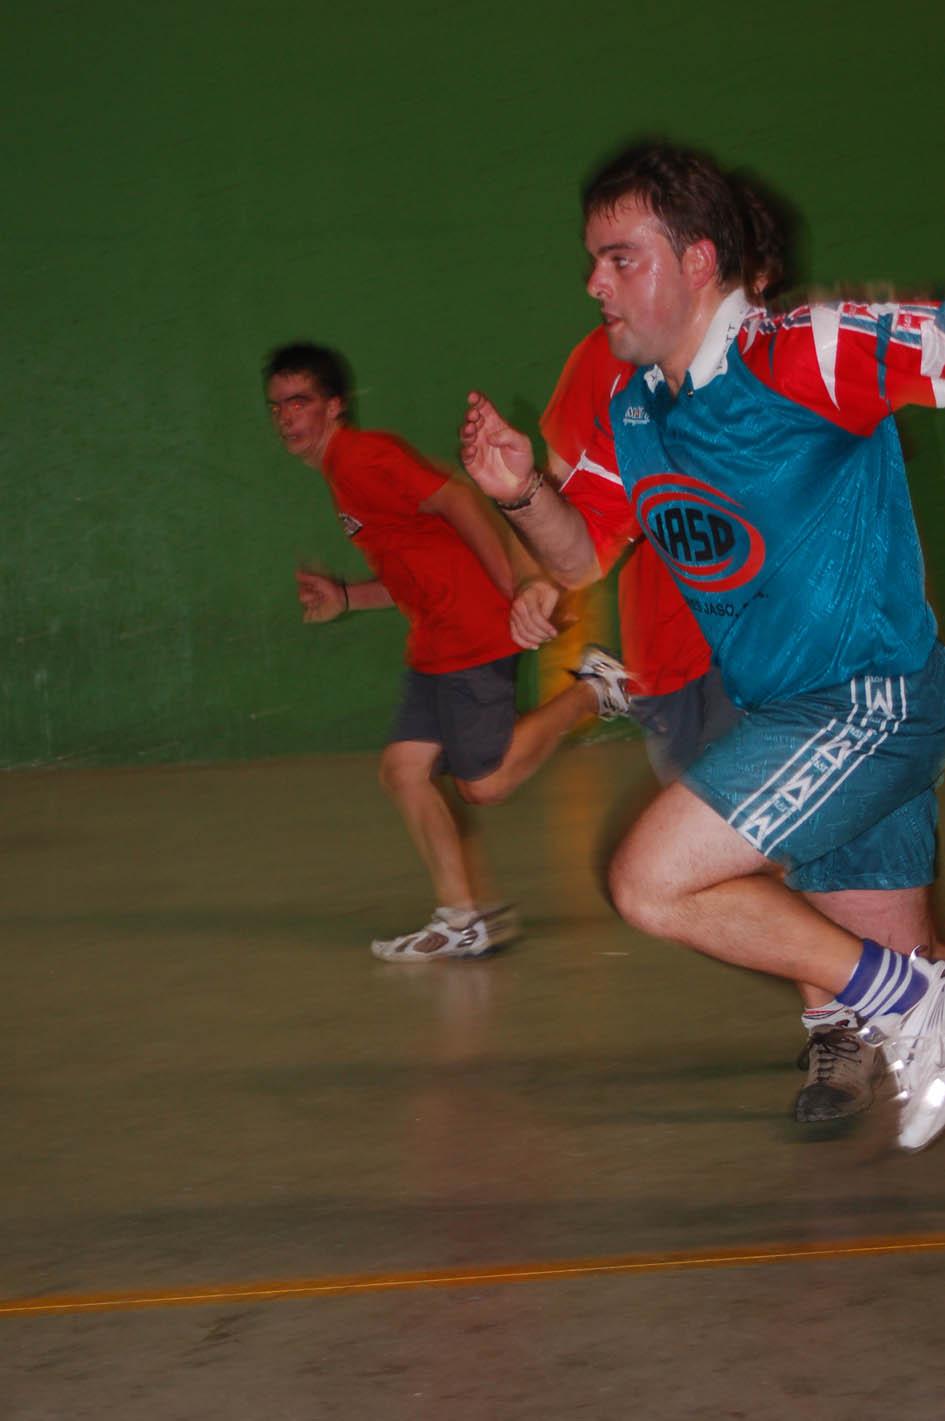 Futbol derbia3